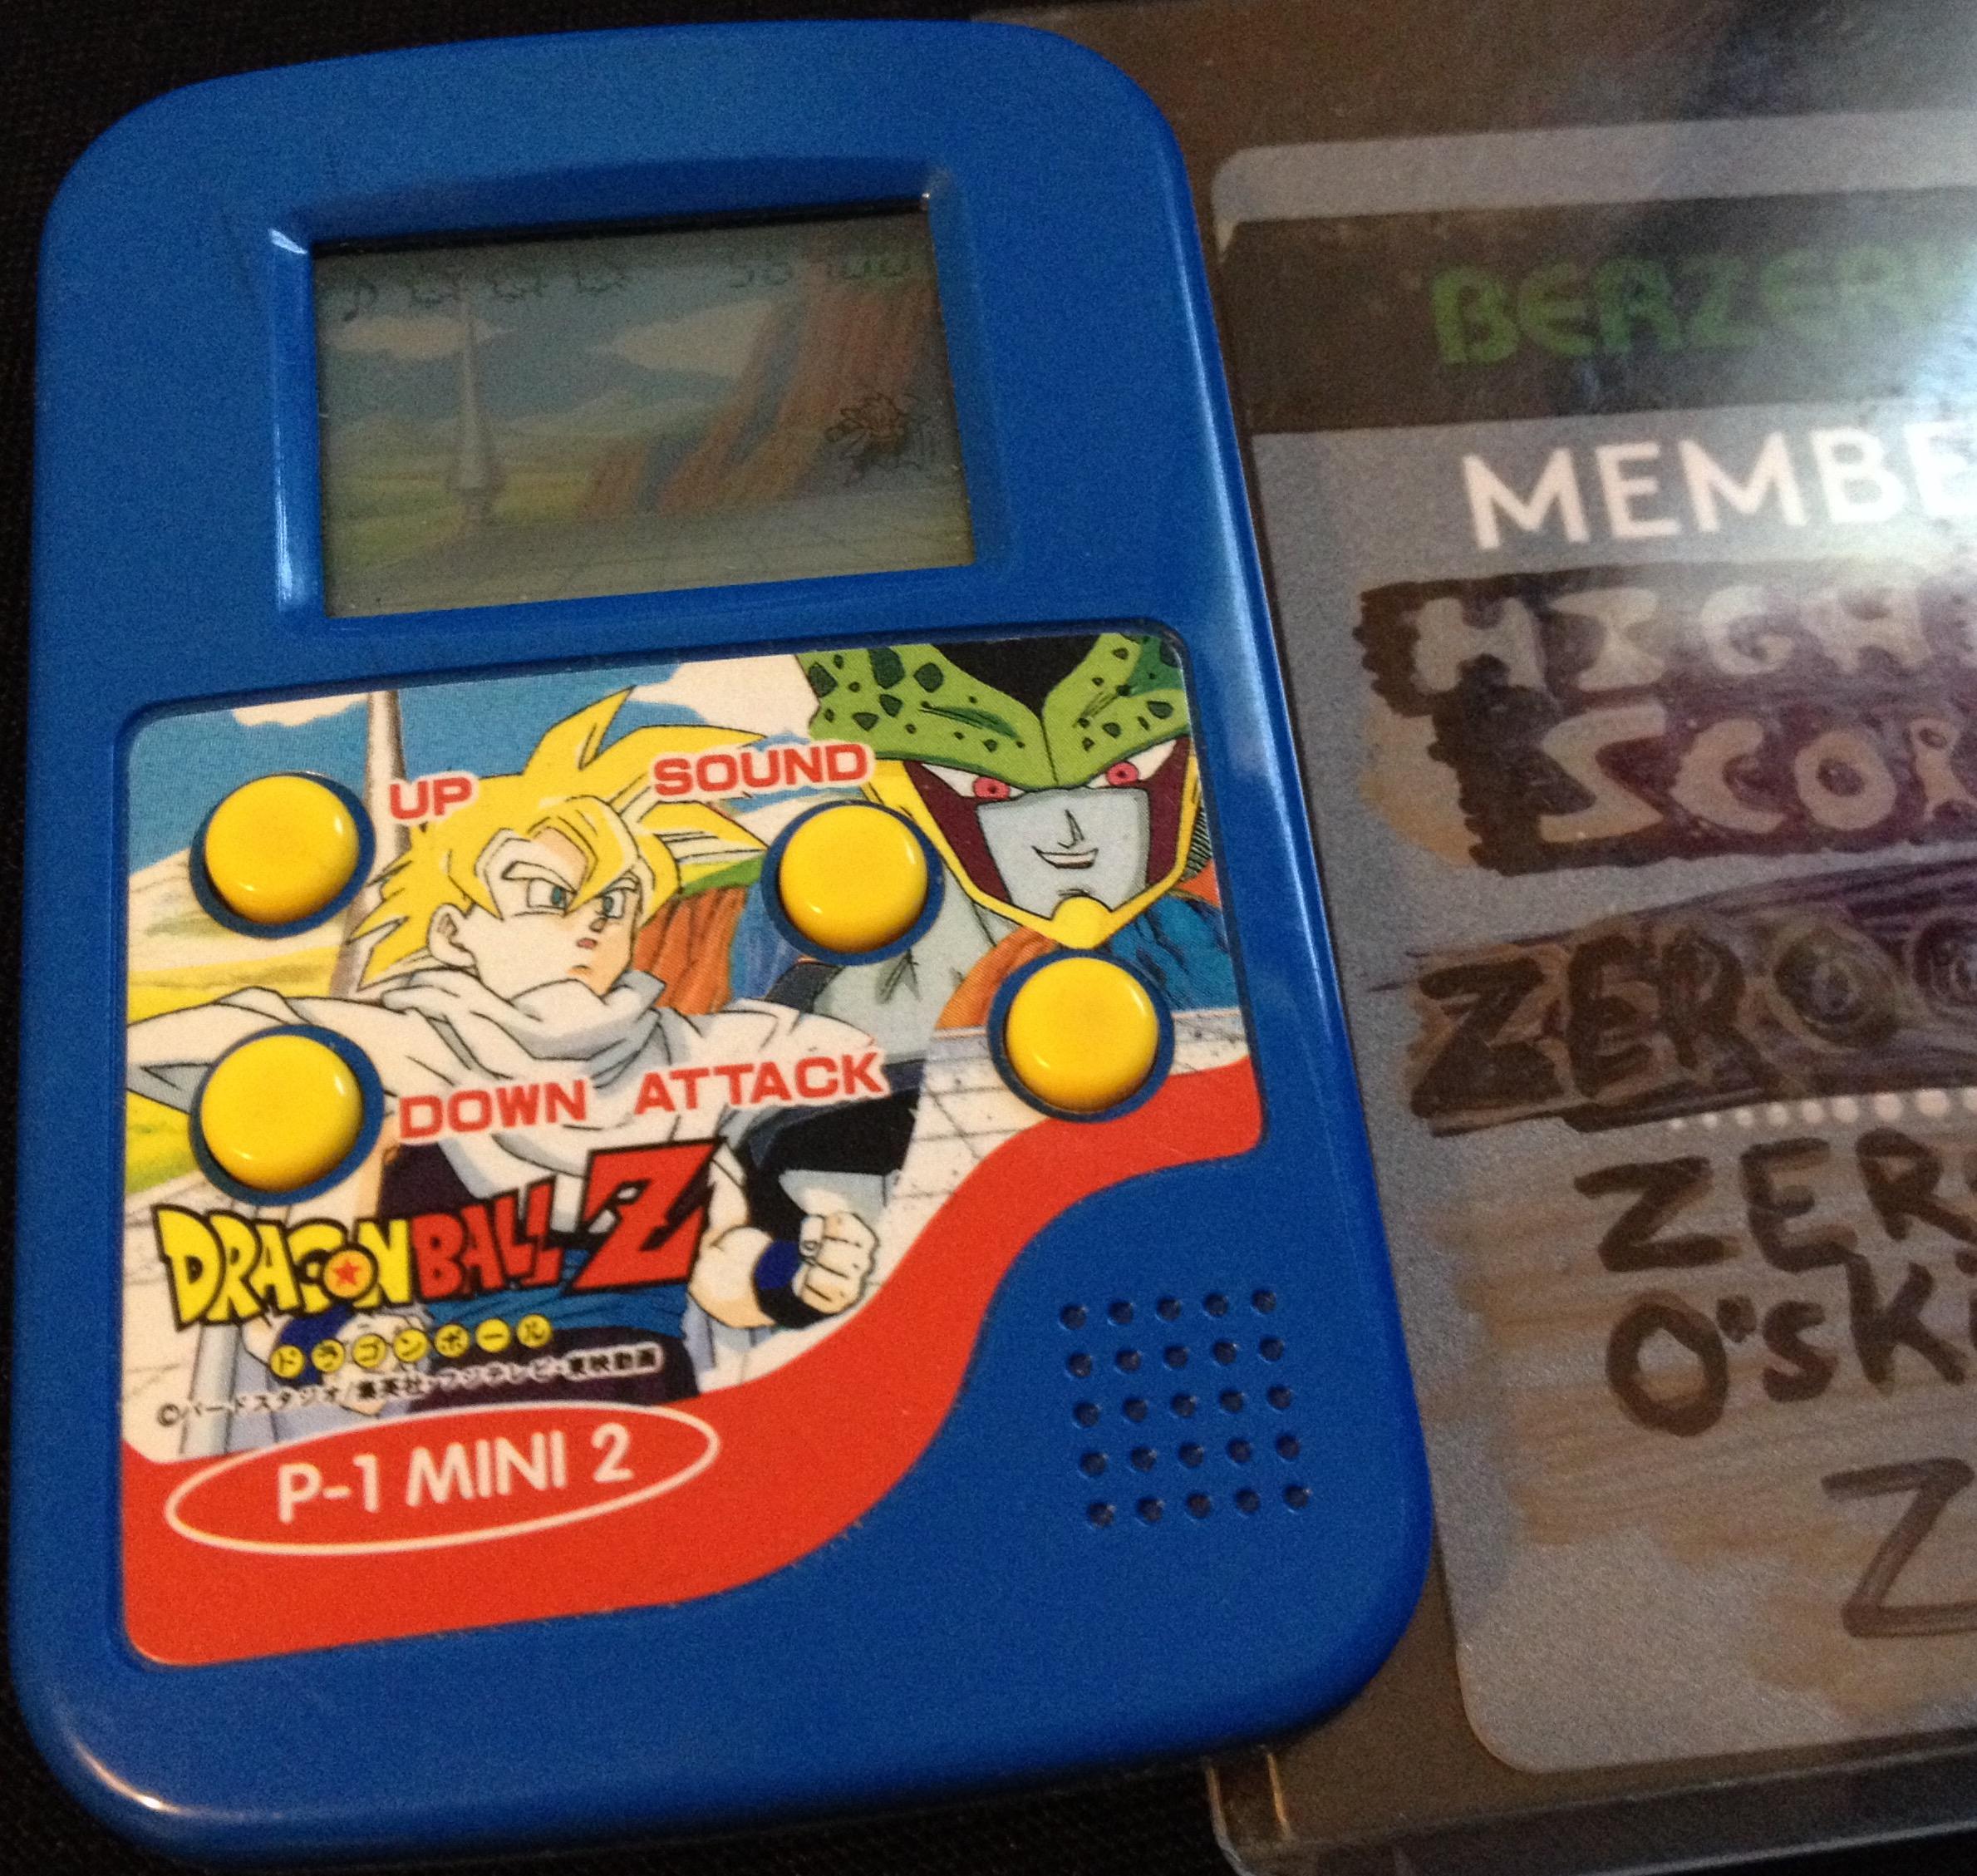 zerooskul: Dragon Ball Z: P-1 Mini 2 (Dedicated Handheld) 56,400 points on 2019-07-14 17:52:25